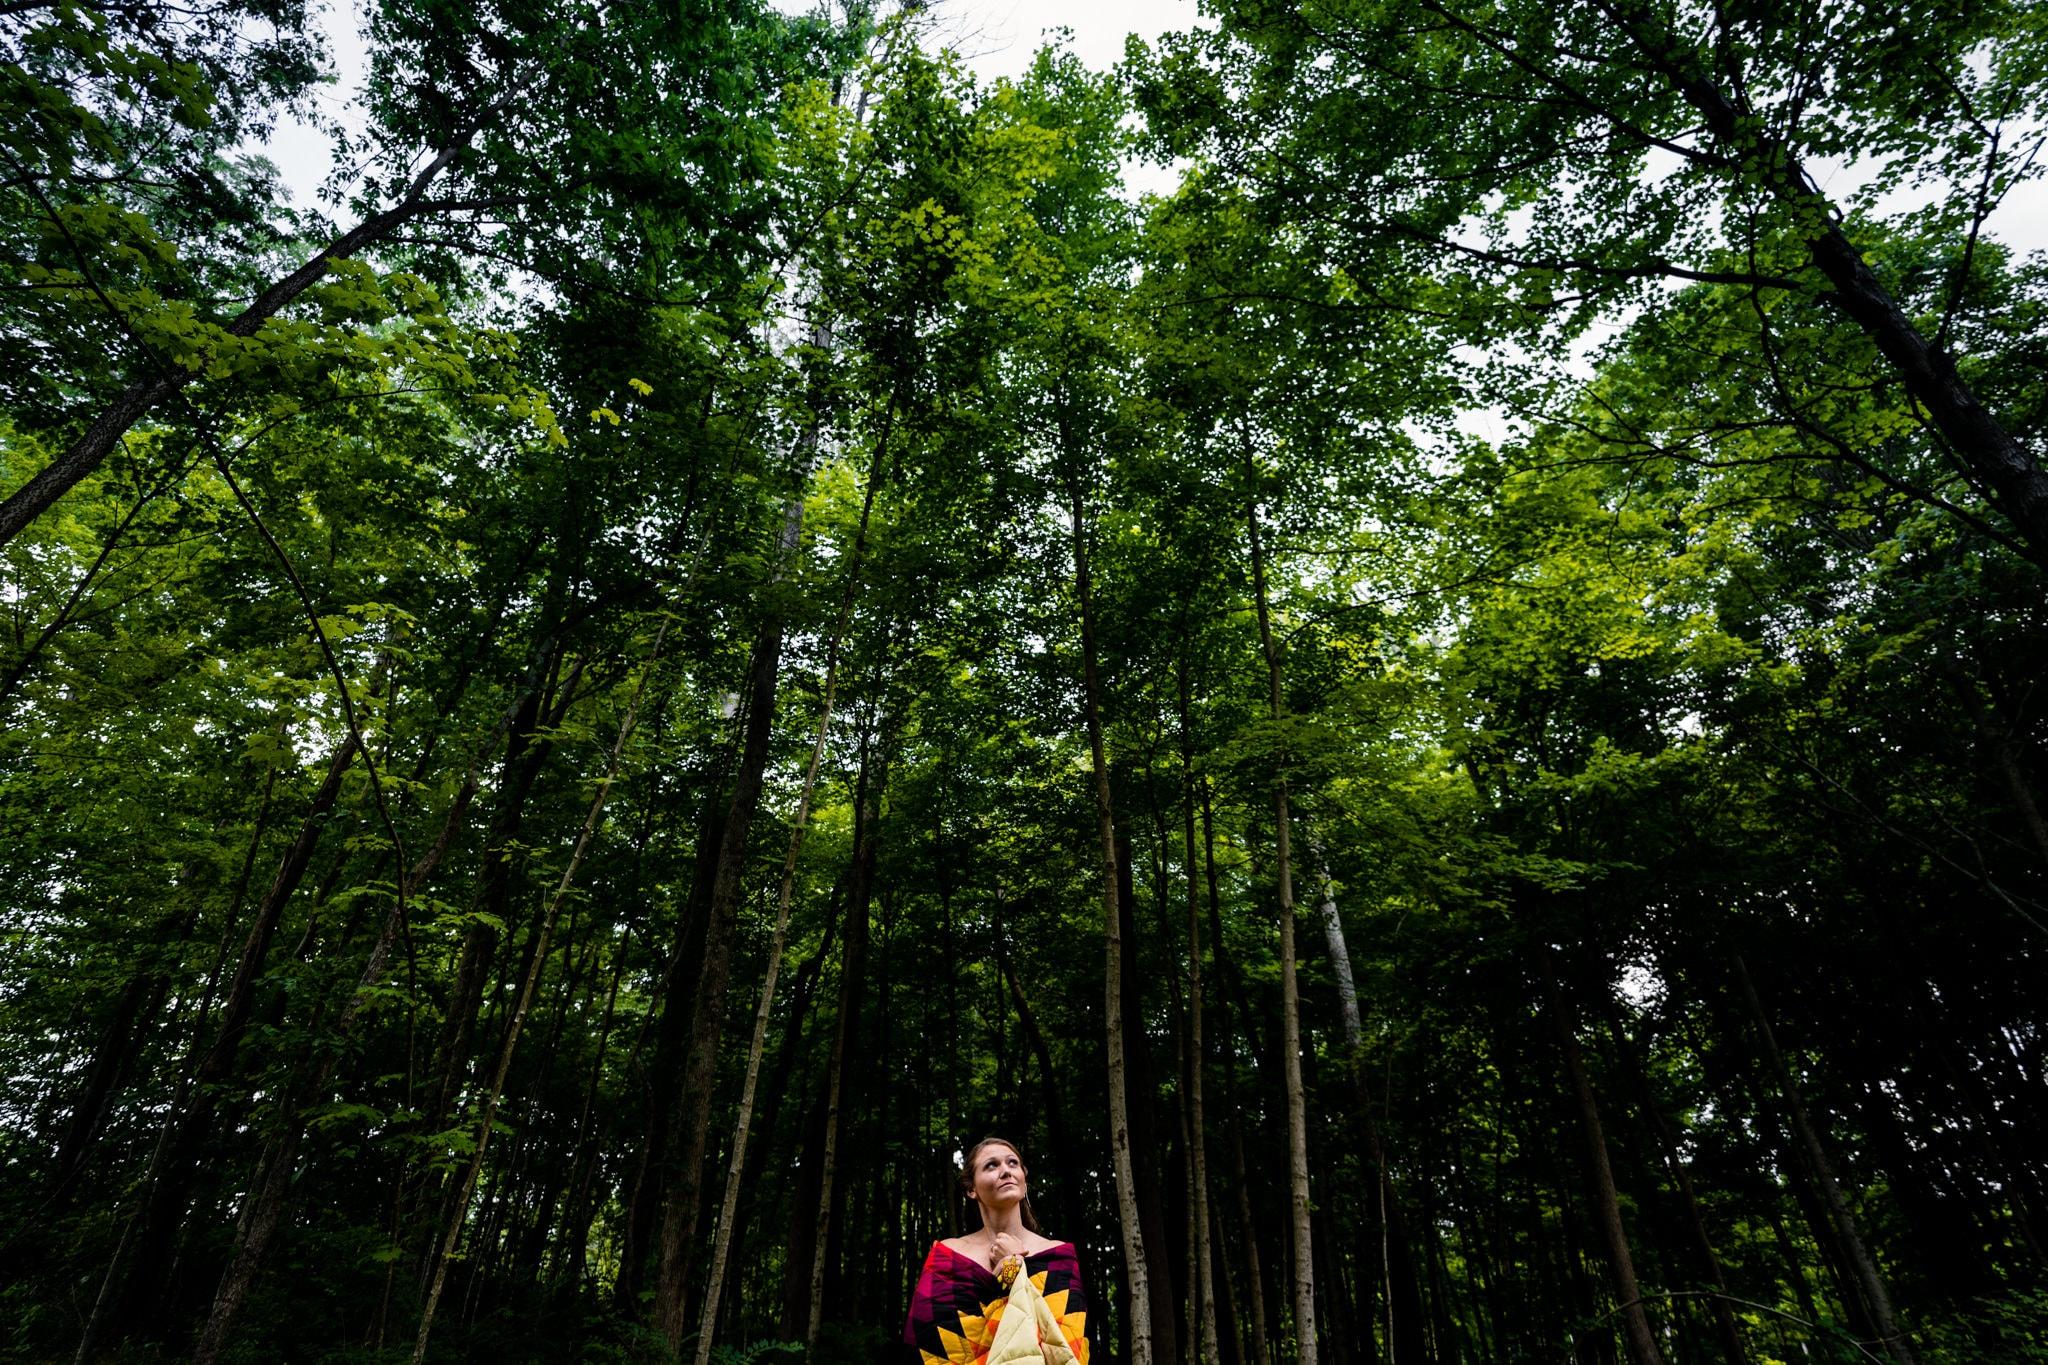 MagMod Wedding Photos - Studio 22 Photography